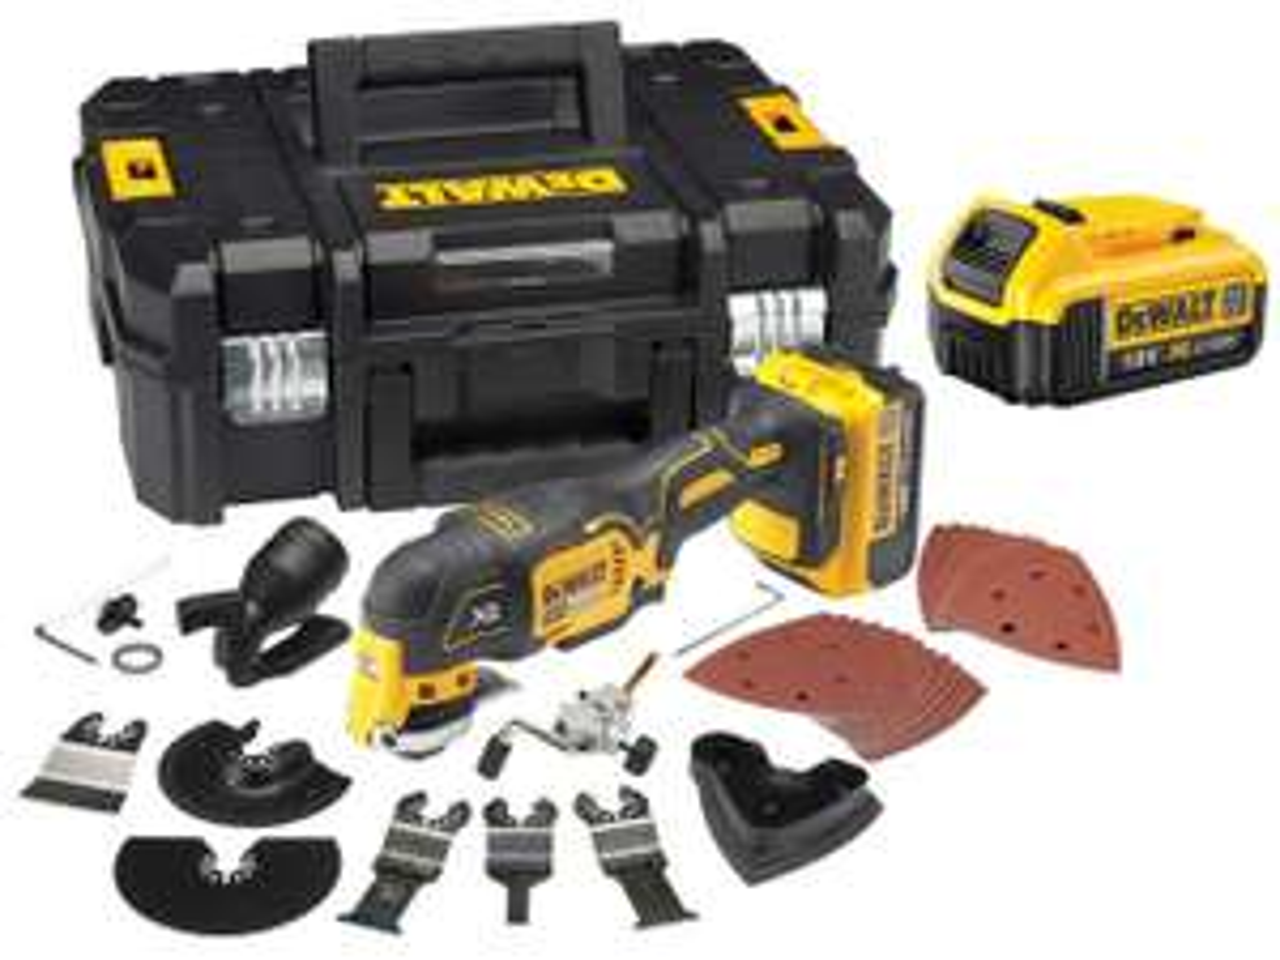 Dewalt 18v brushless Multi tool - 2 x 4.0ah batteries - £229.00 @ FFX